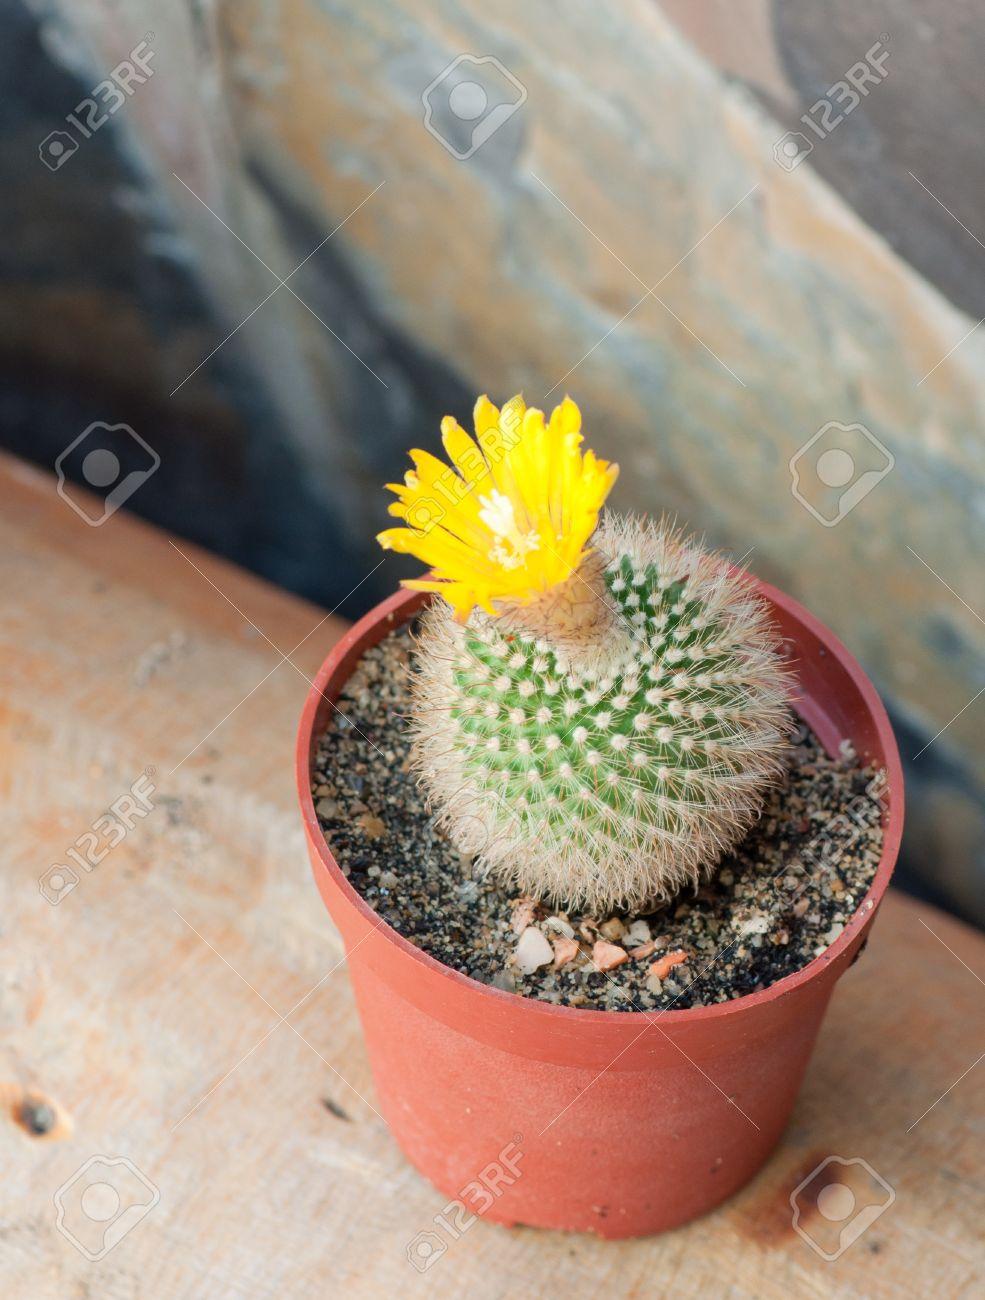 Cactus with yellow flower mini size stock photo picture and cactus with yellow flower mini size stock photo 13170833 mightylinksfo Images